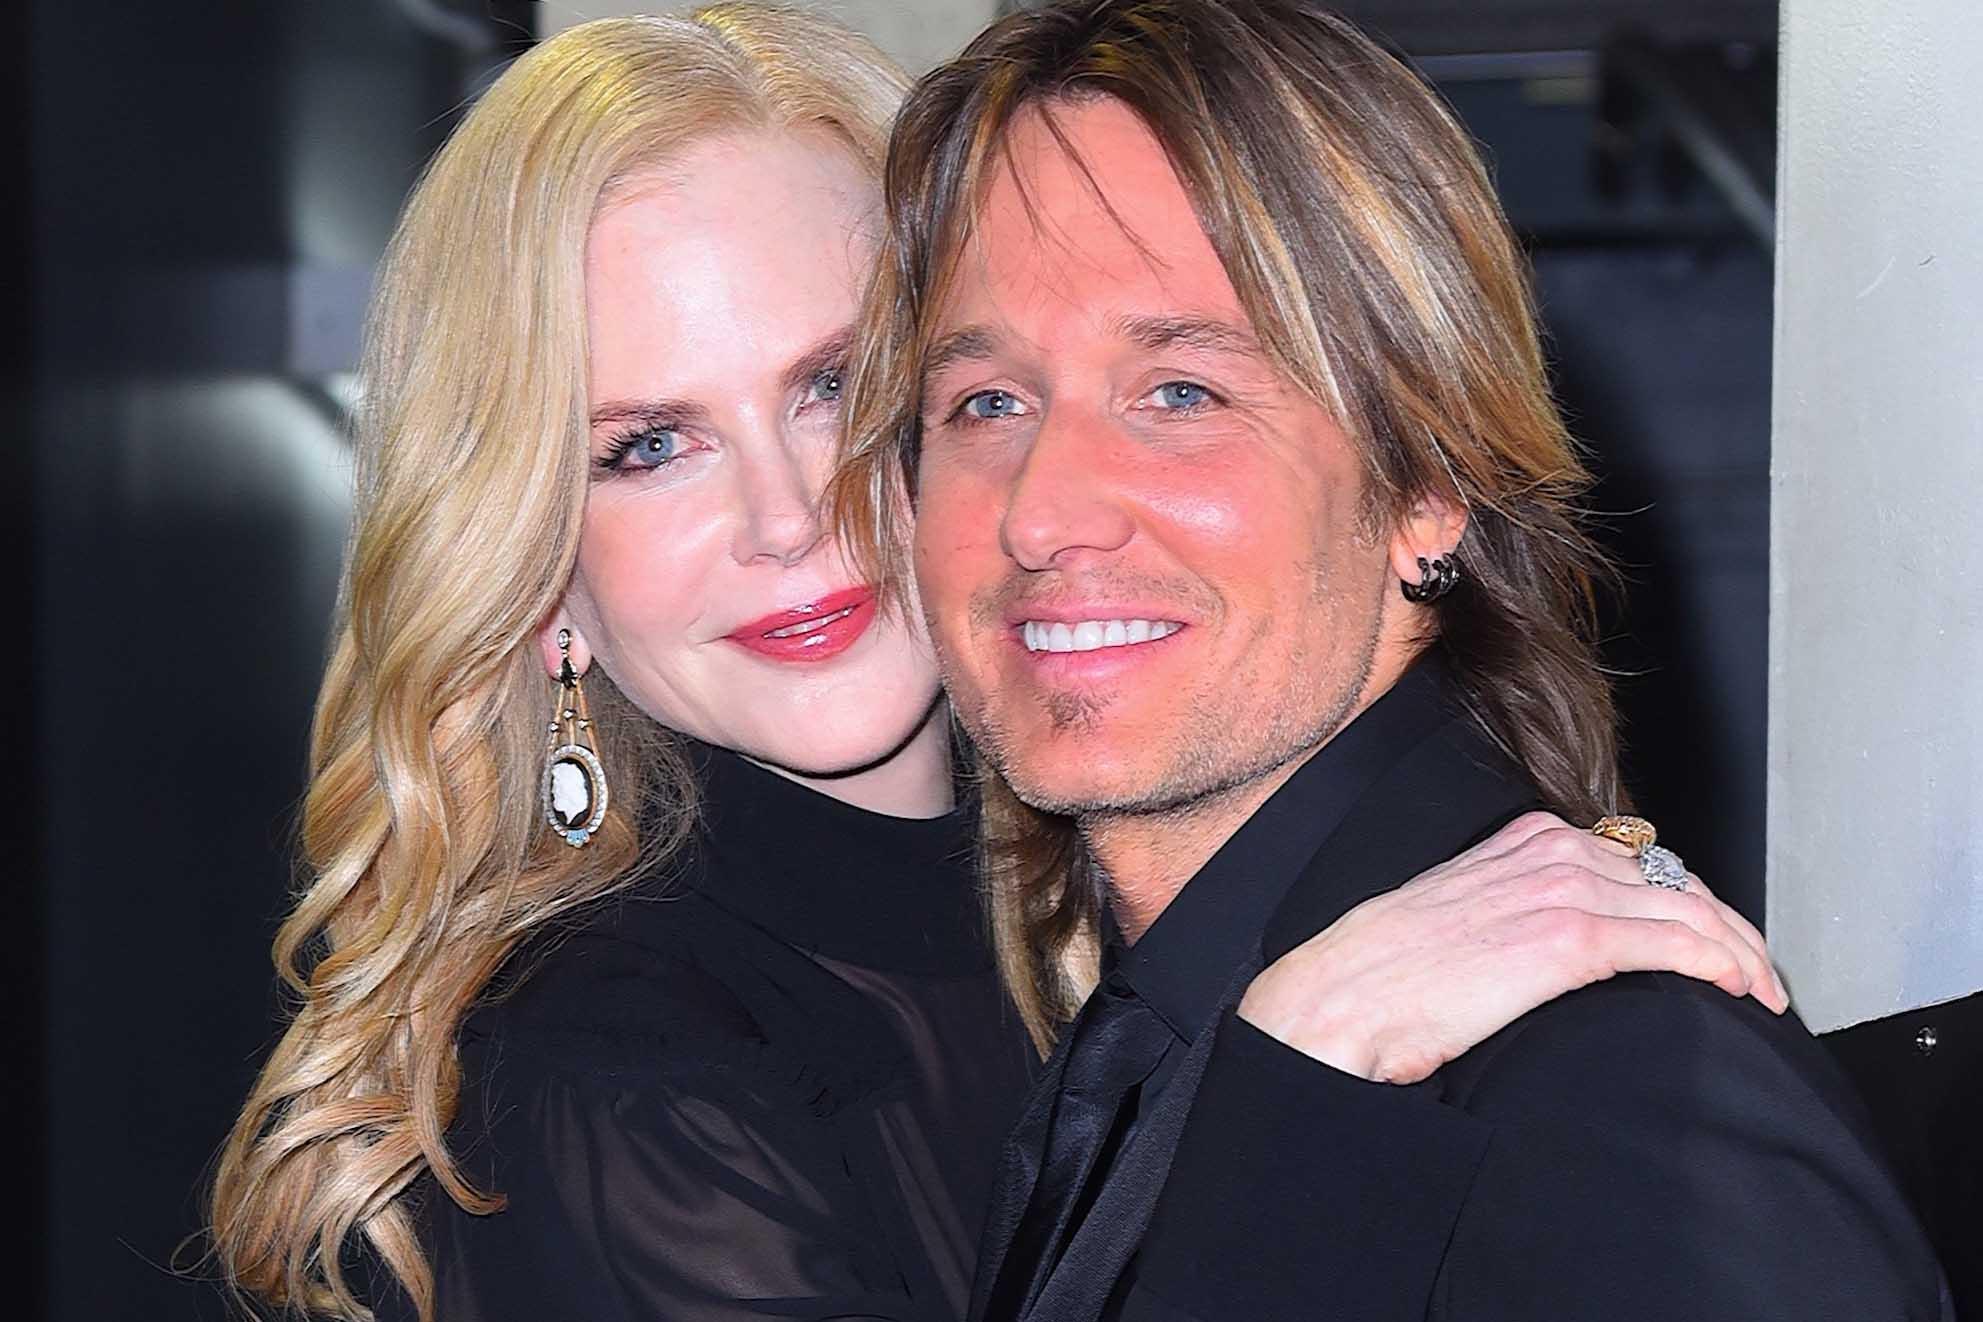 Nicole Kidman From Keith Urban: Nicole Kidman Tells Keith Urban To Stop Doing This One